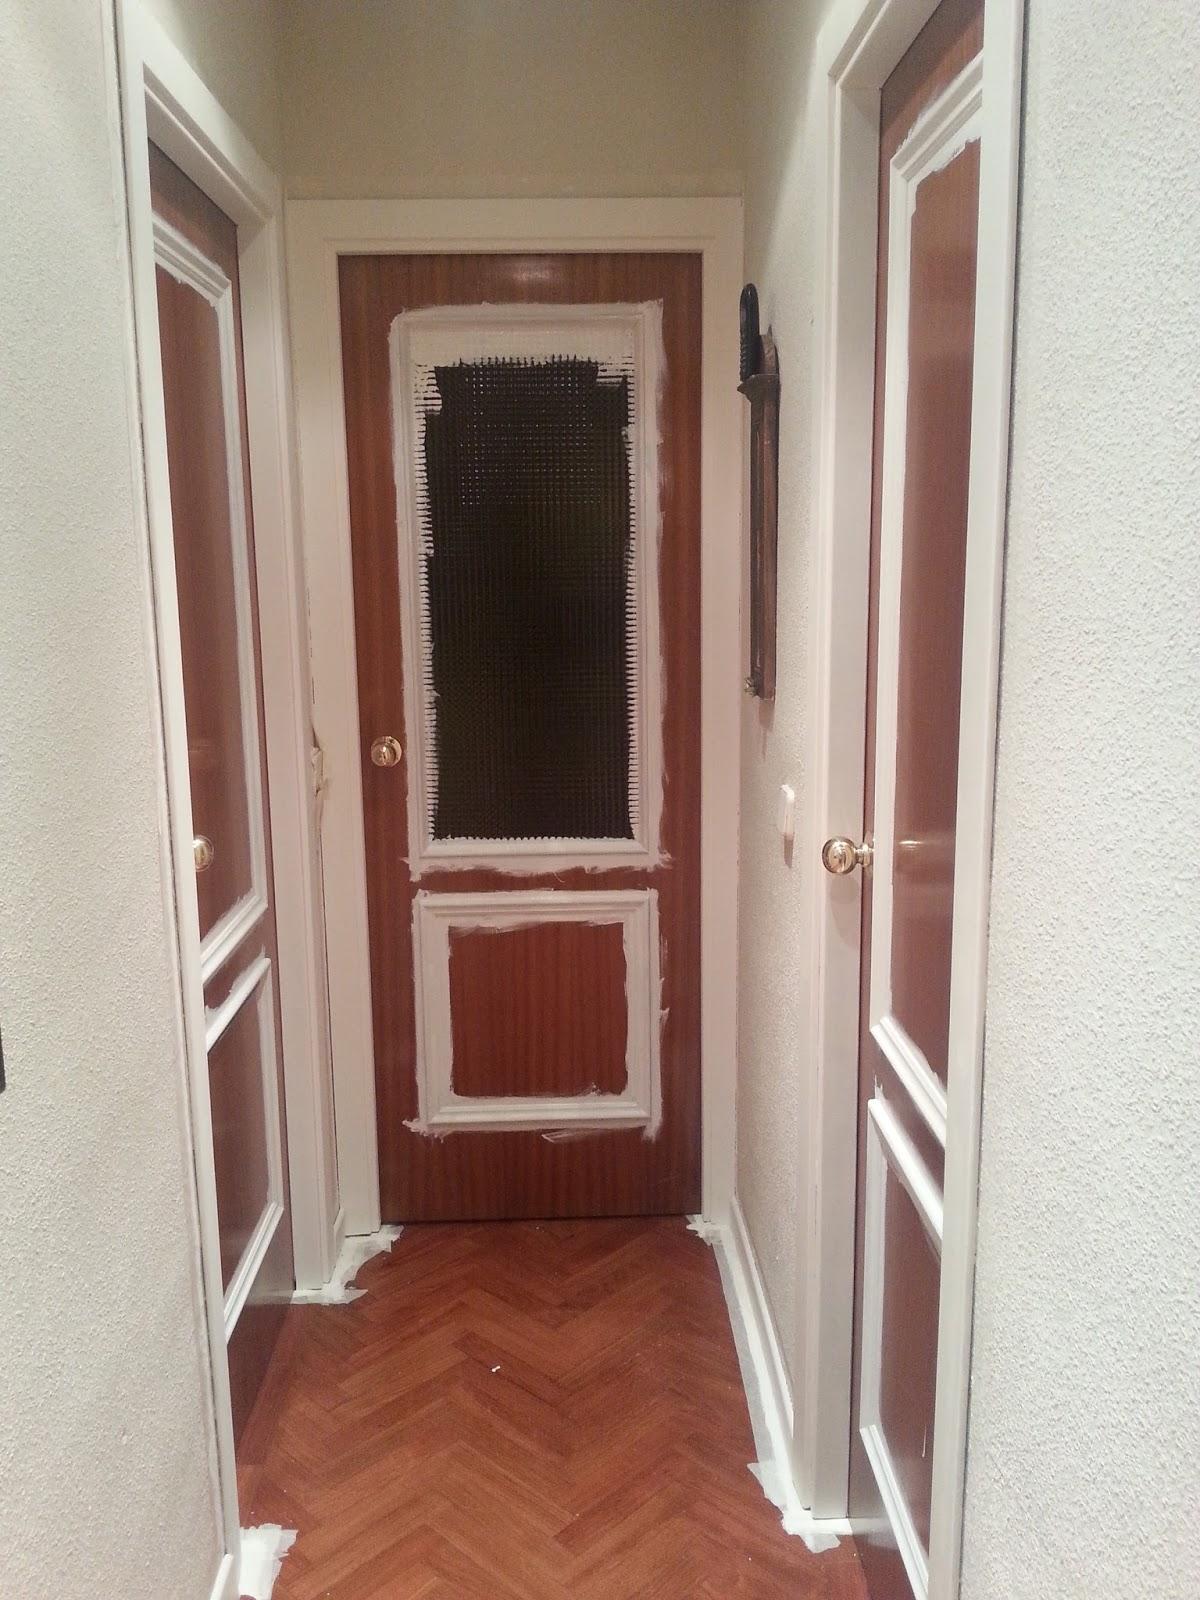 Pintar puertas barnizadas sin lijar materiales de - Pintar puertas de madera sin lijar ...